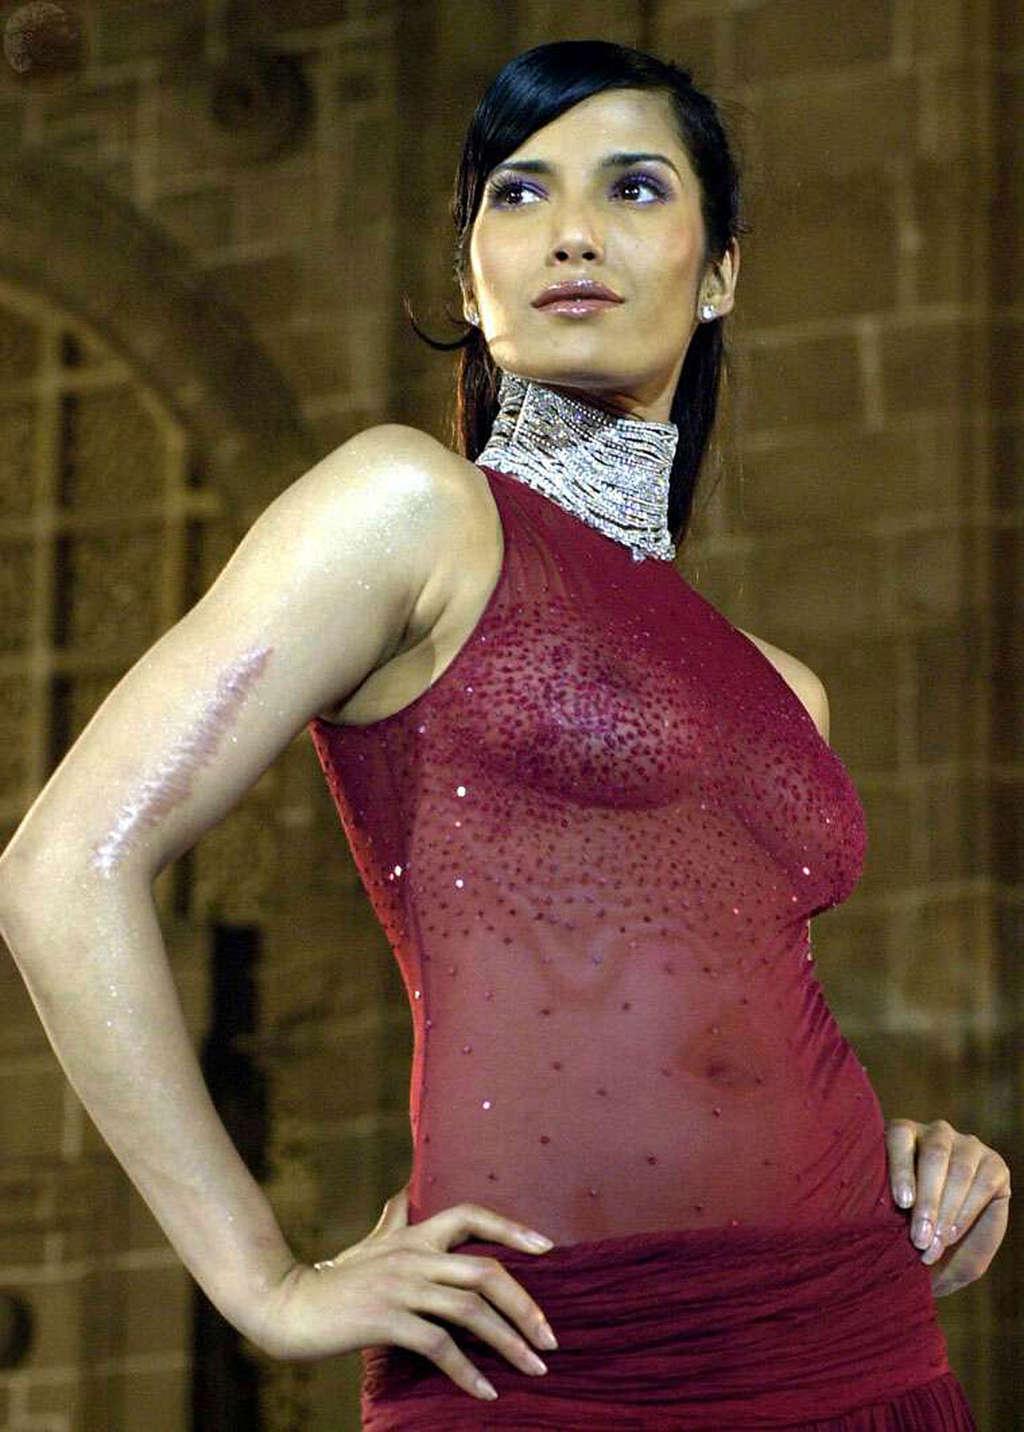 arianny celeste: Indian Super Model Padma Lakshmi lets